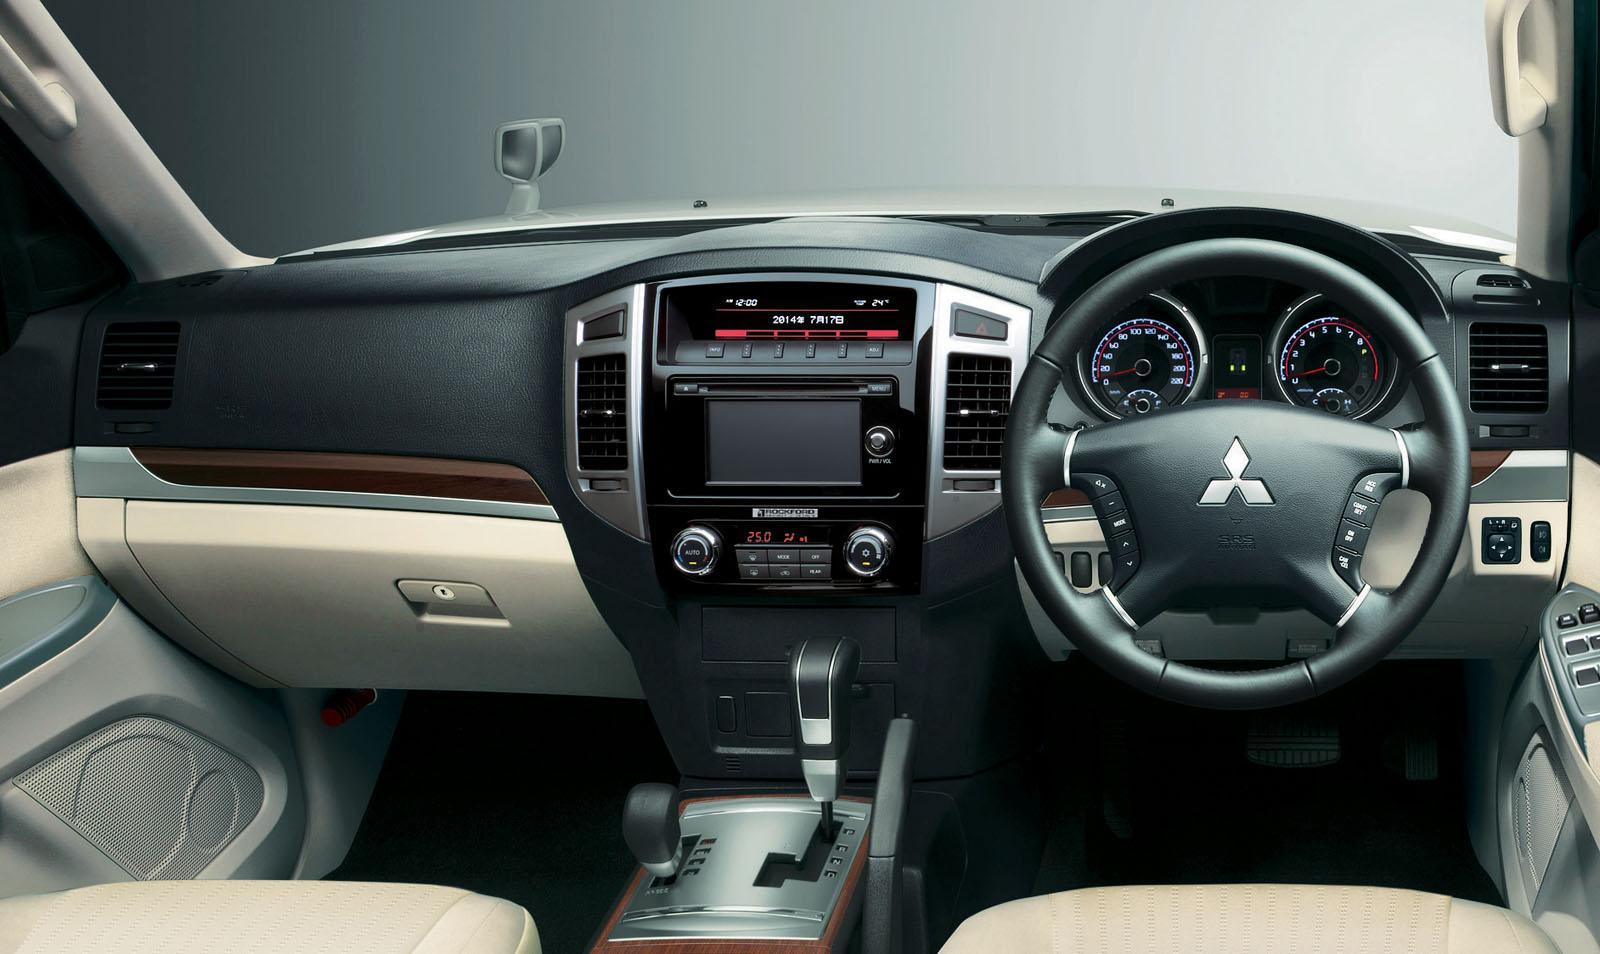 mitsubishi montero 2015 philippines 2017 2018 best cars reviews - Mitsubishi Montero 2015 Interior